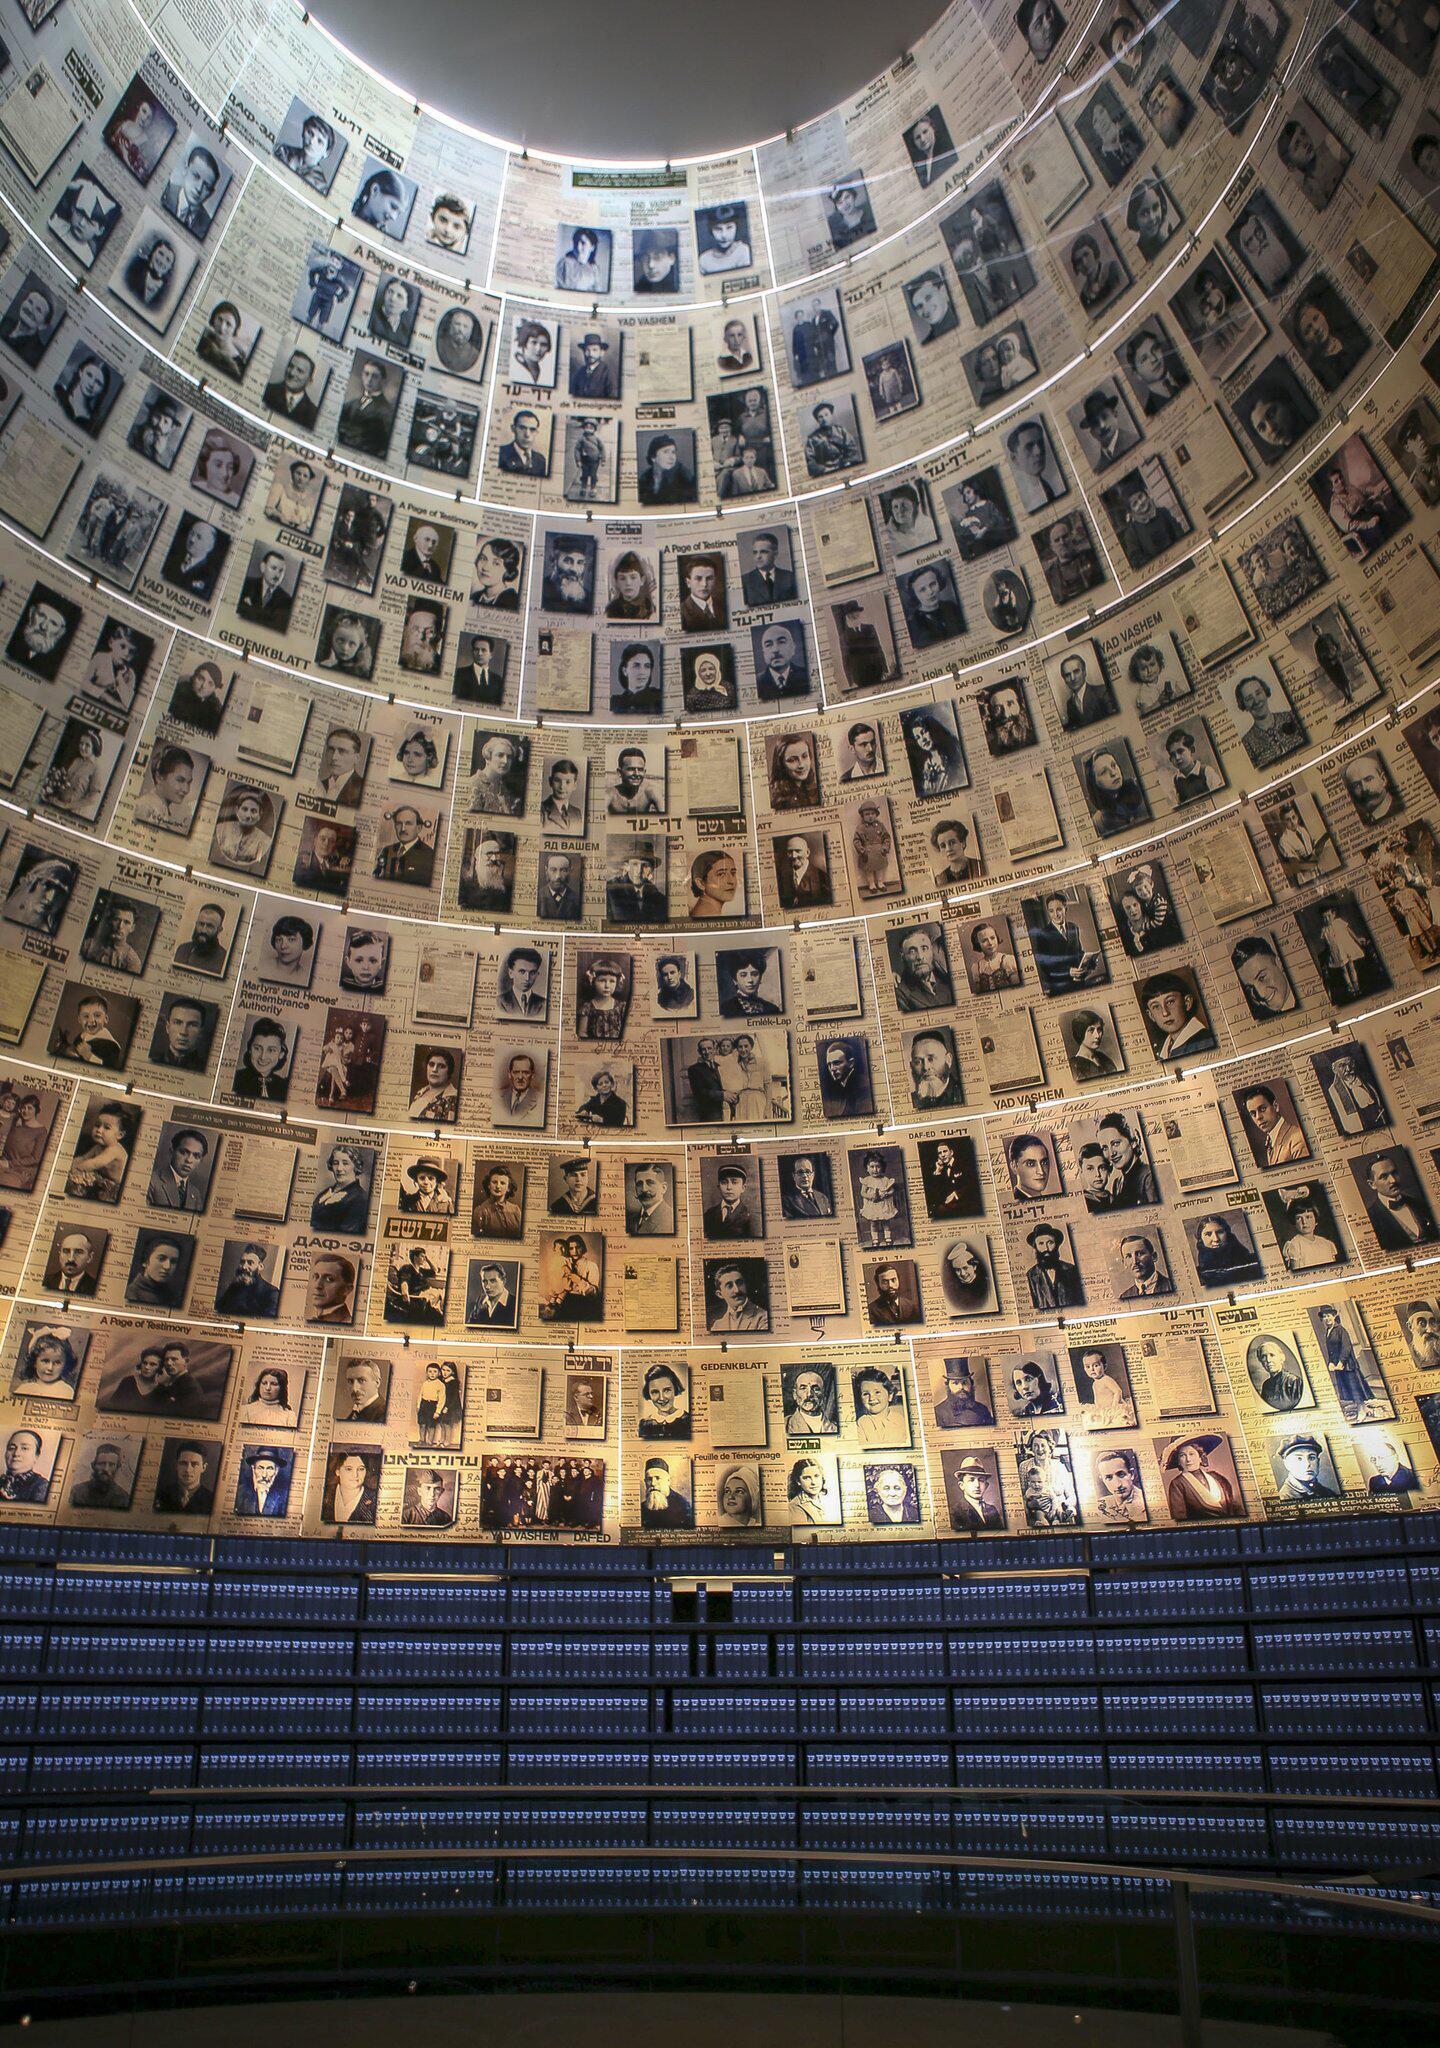 Bild zu Holocaust-Gedenkstätte Yad Vashem in Jerusalem